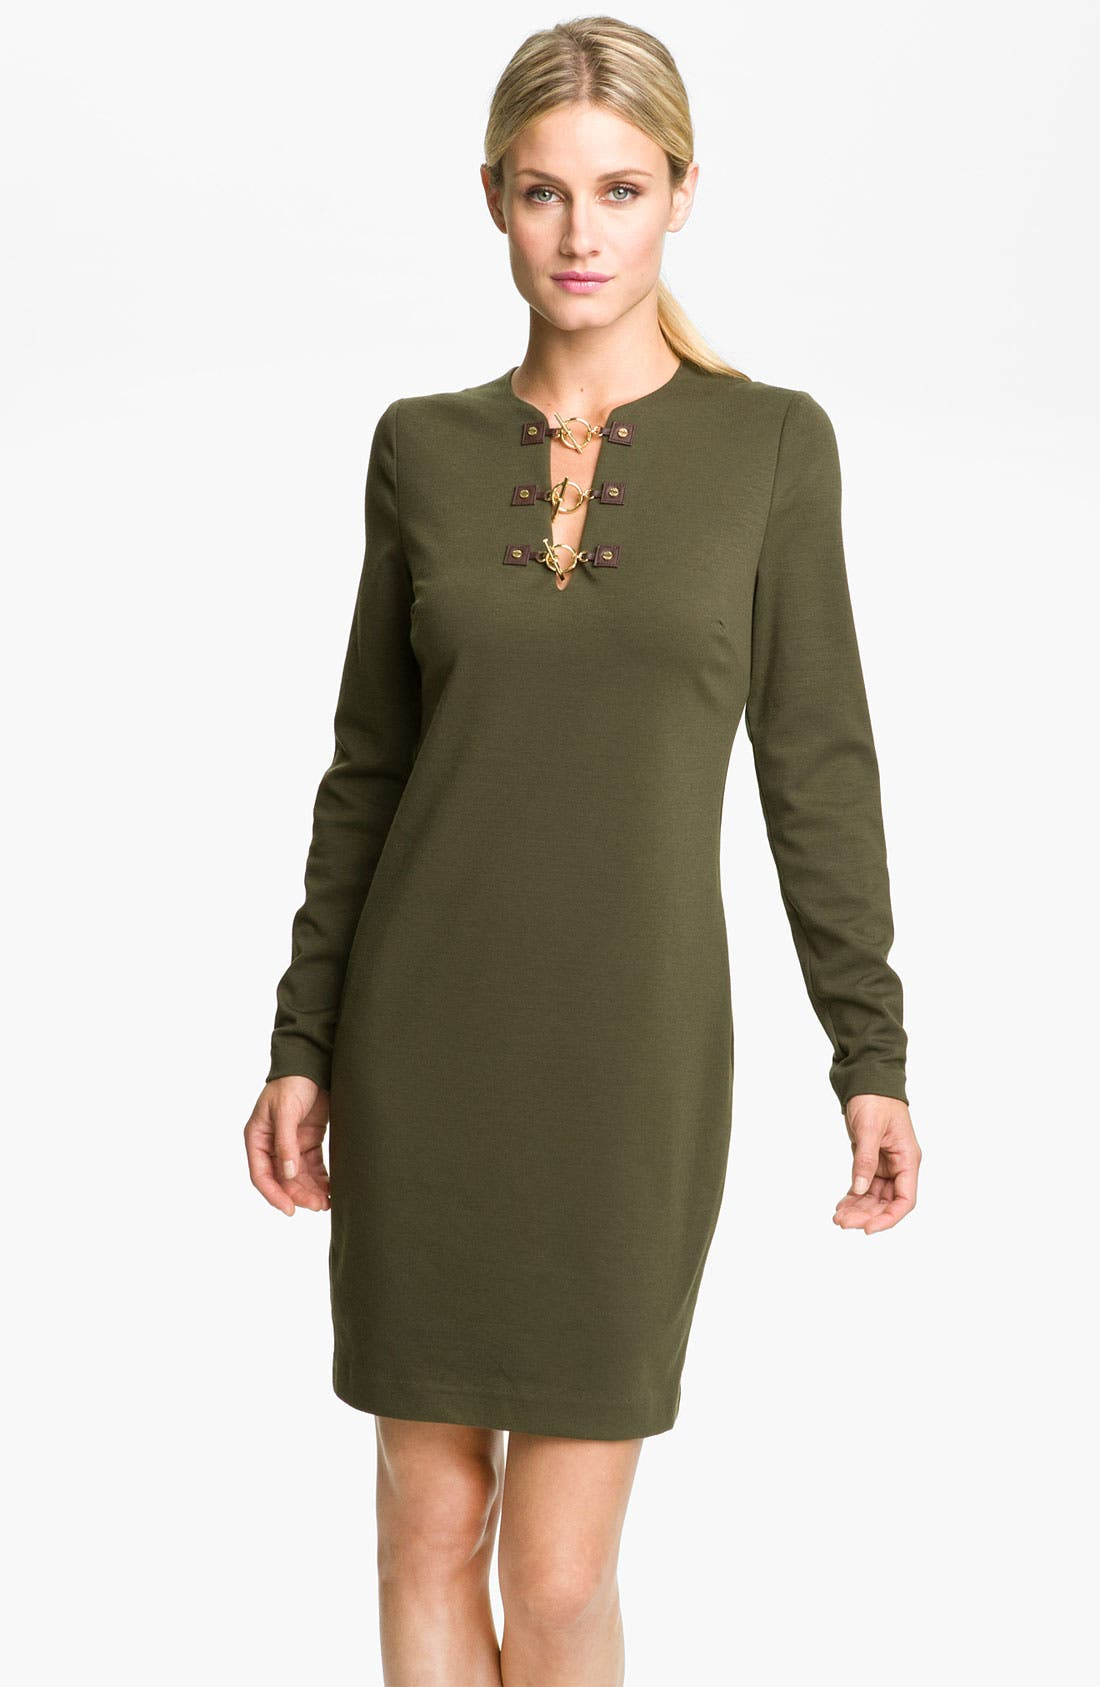 Alternate Image 1 Selected - MICHAEL Michael Kors Toggle Neck Dress